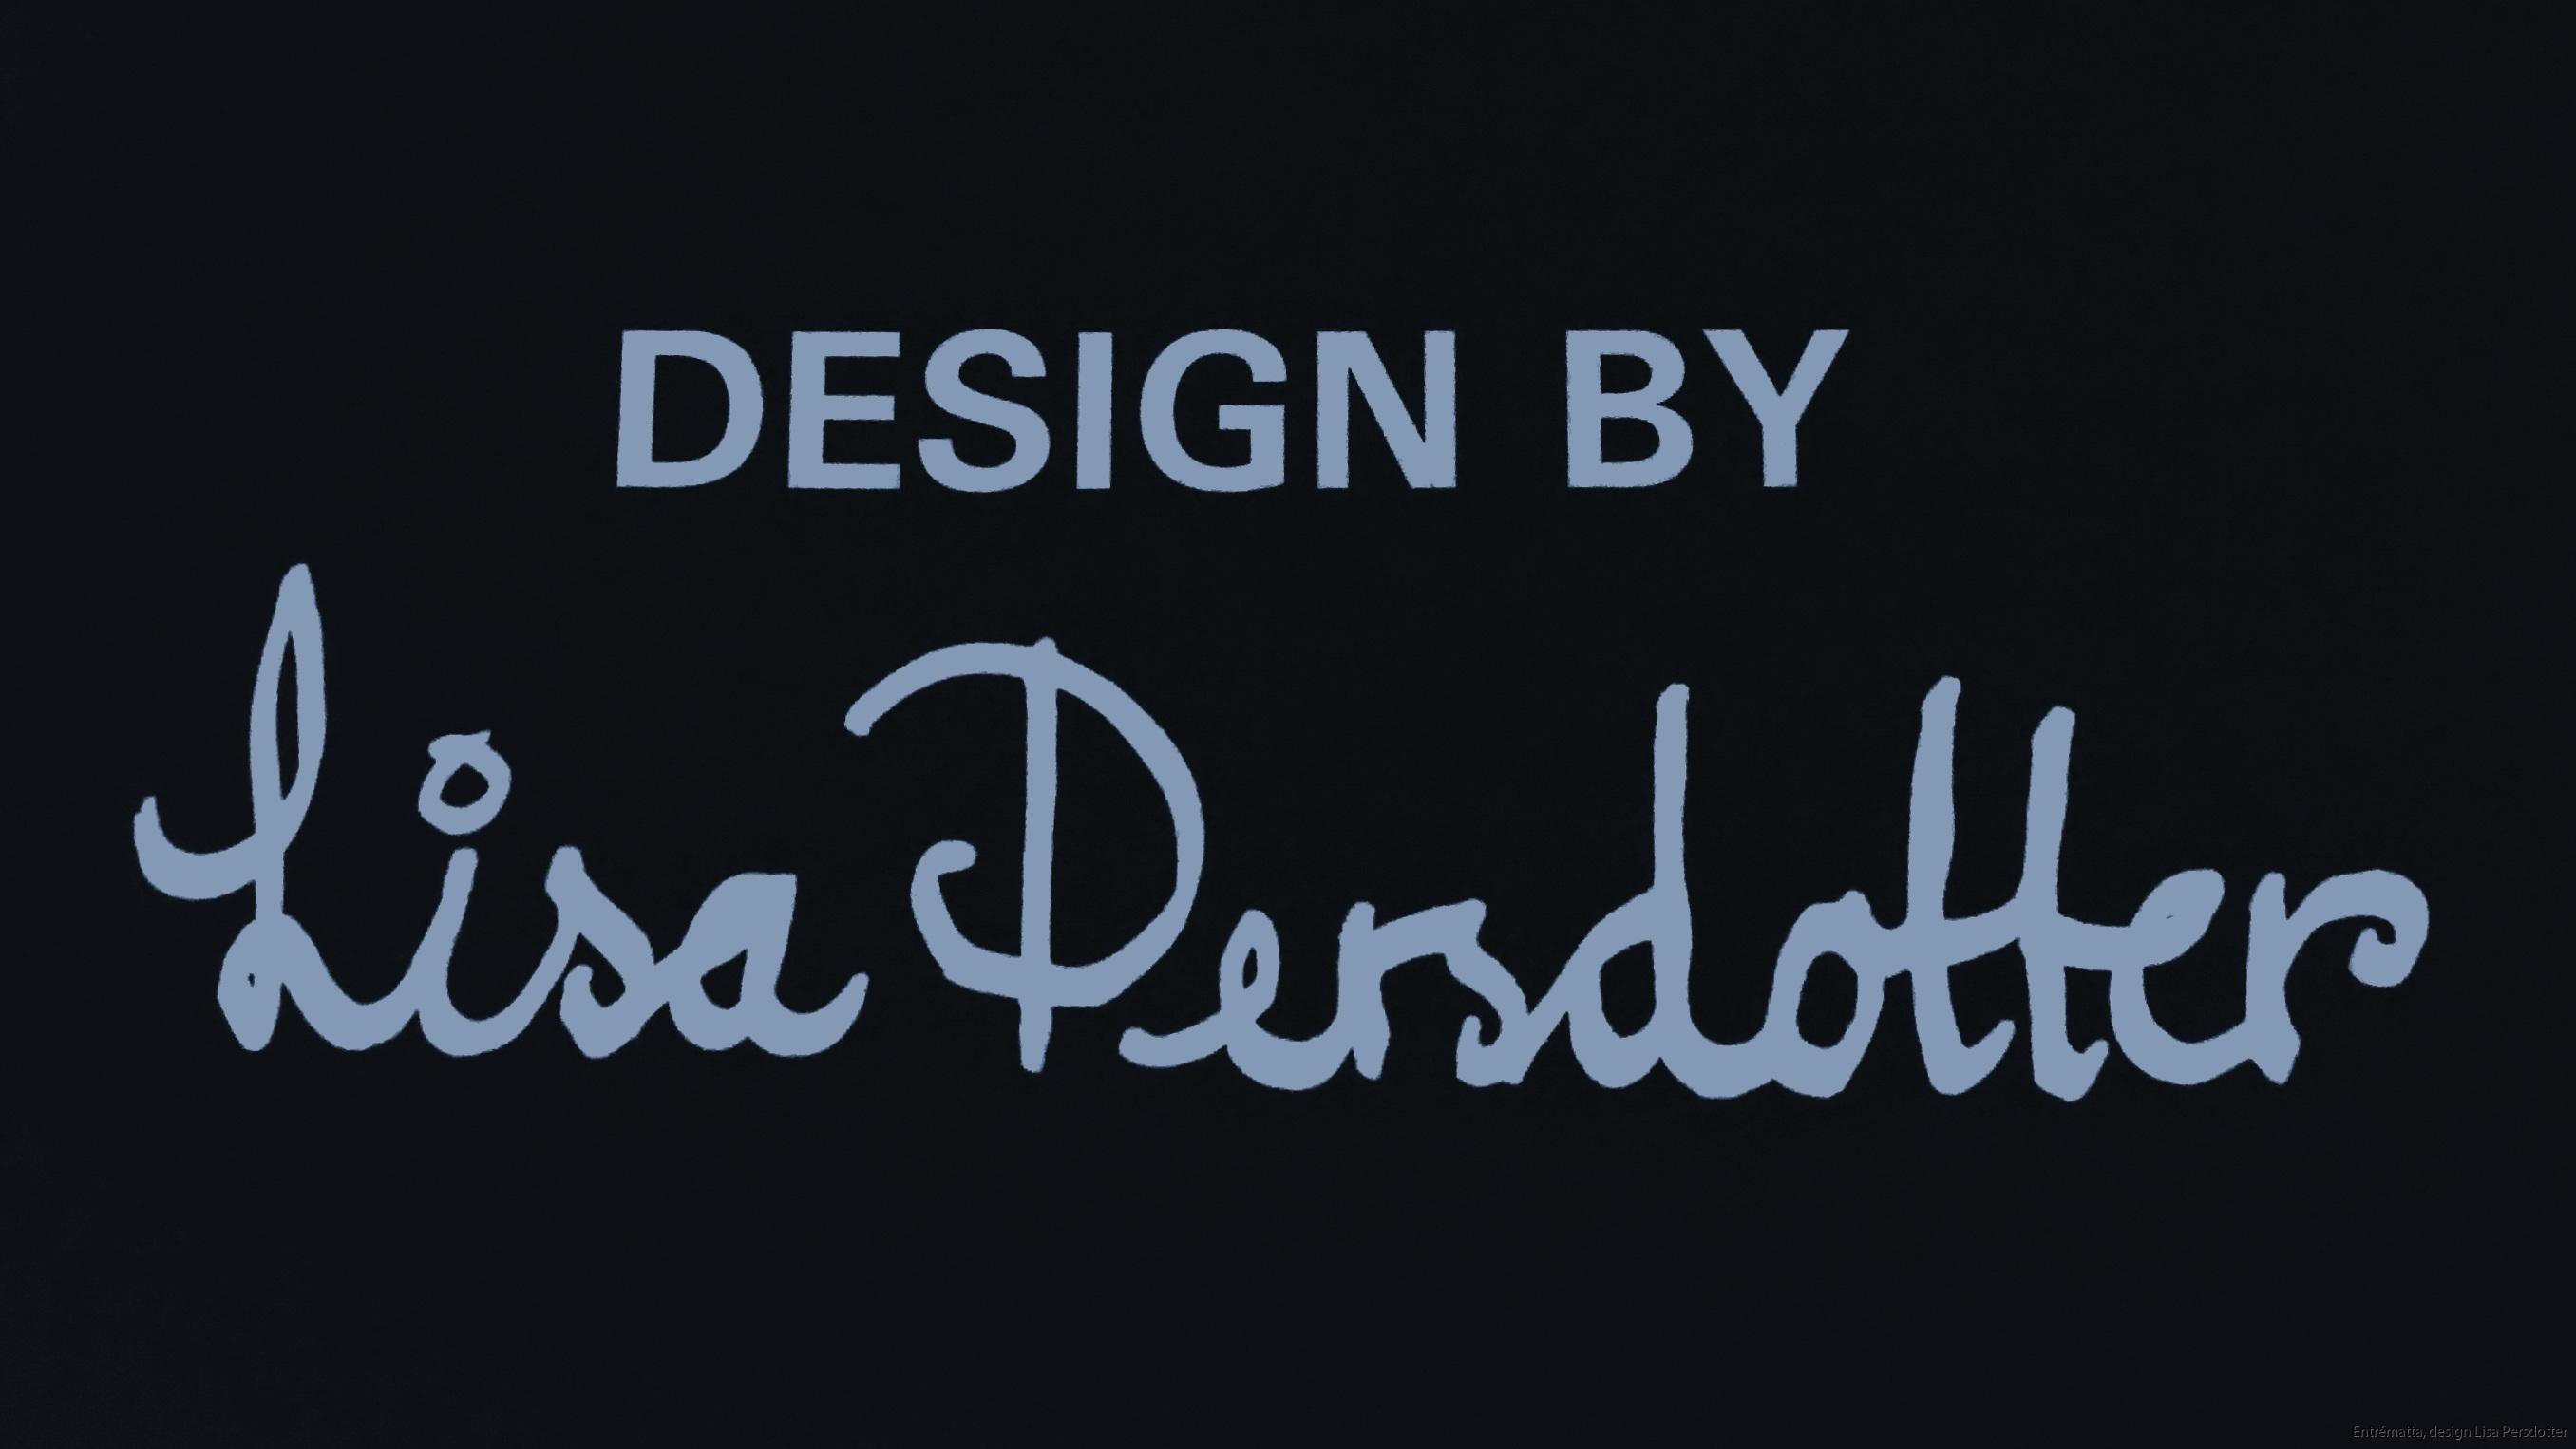 Design Lisa Persdotter kopiera negativ